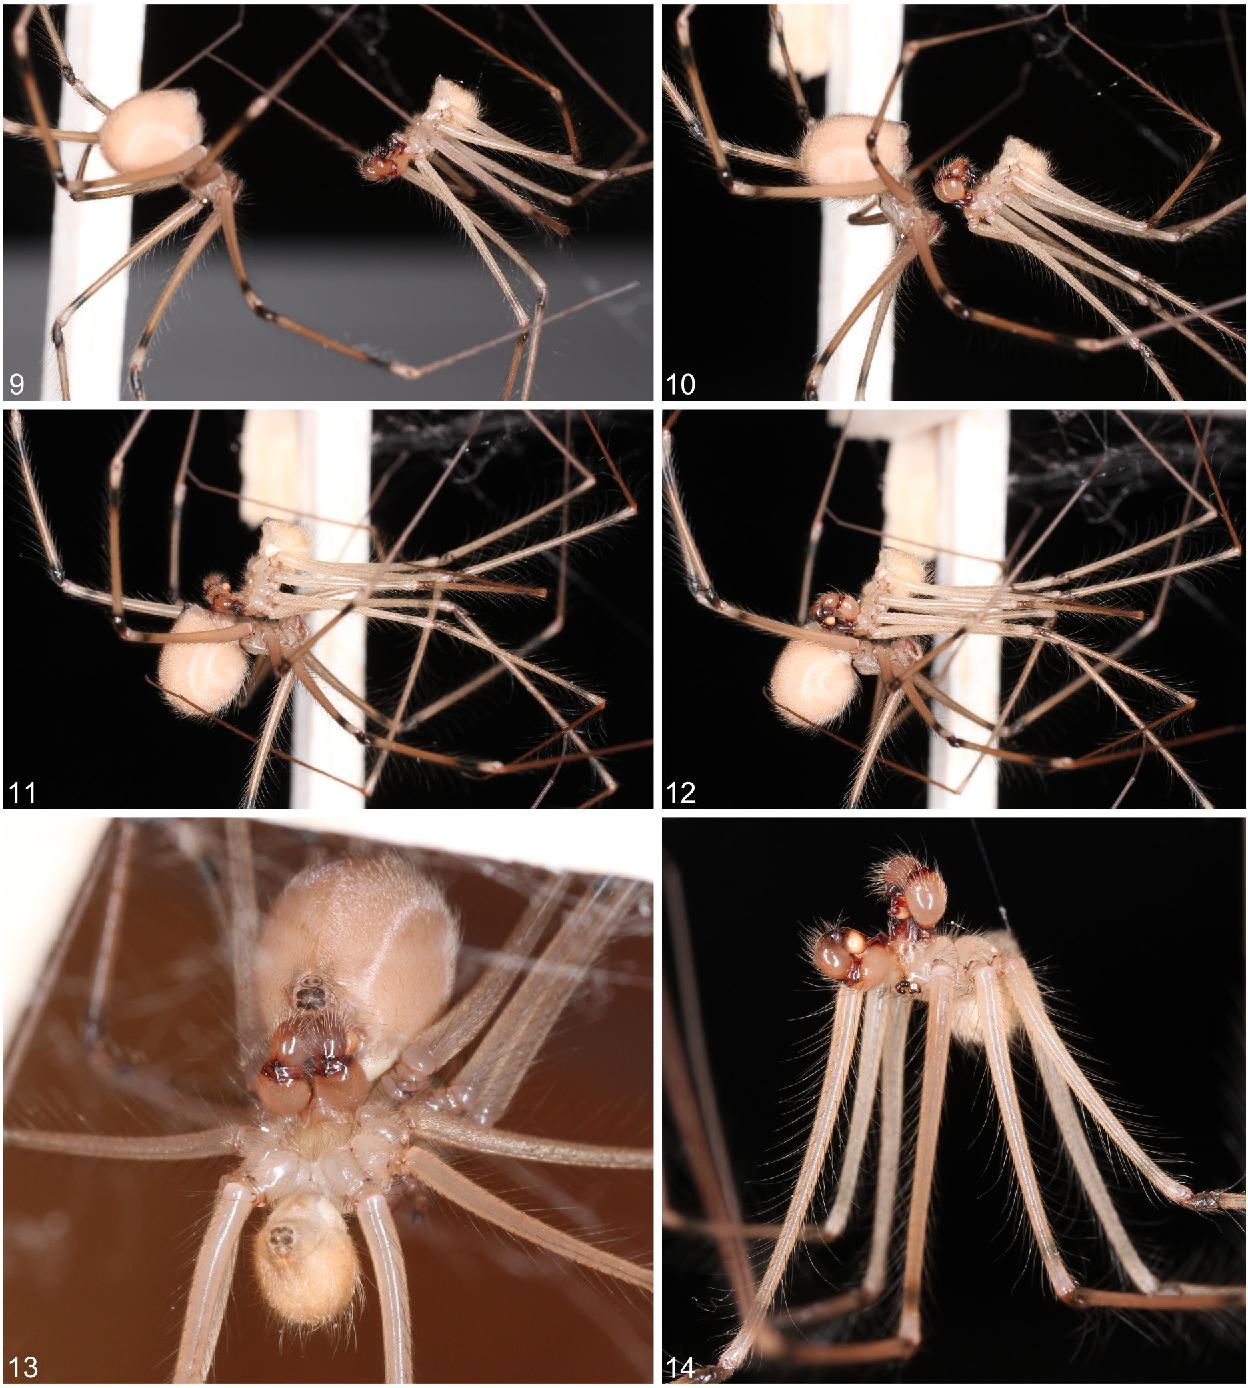 figure 9–14